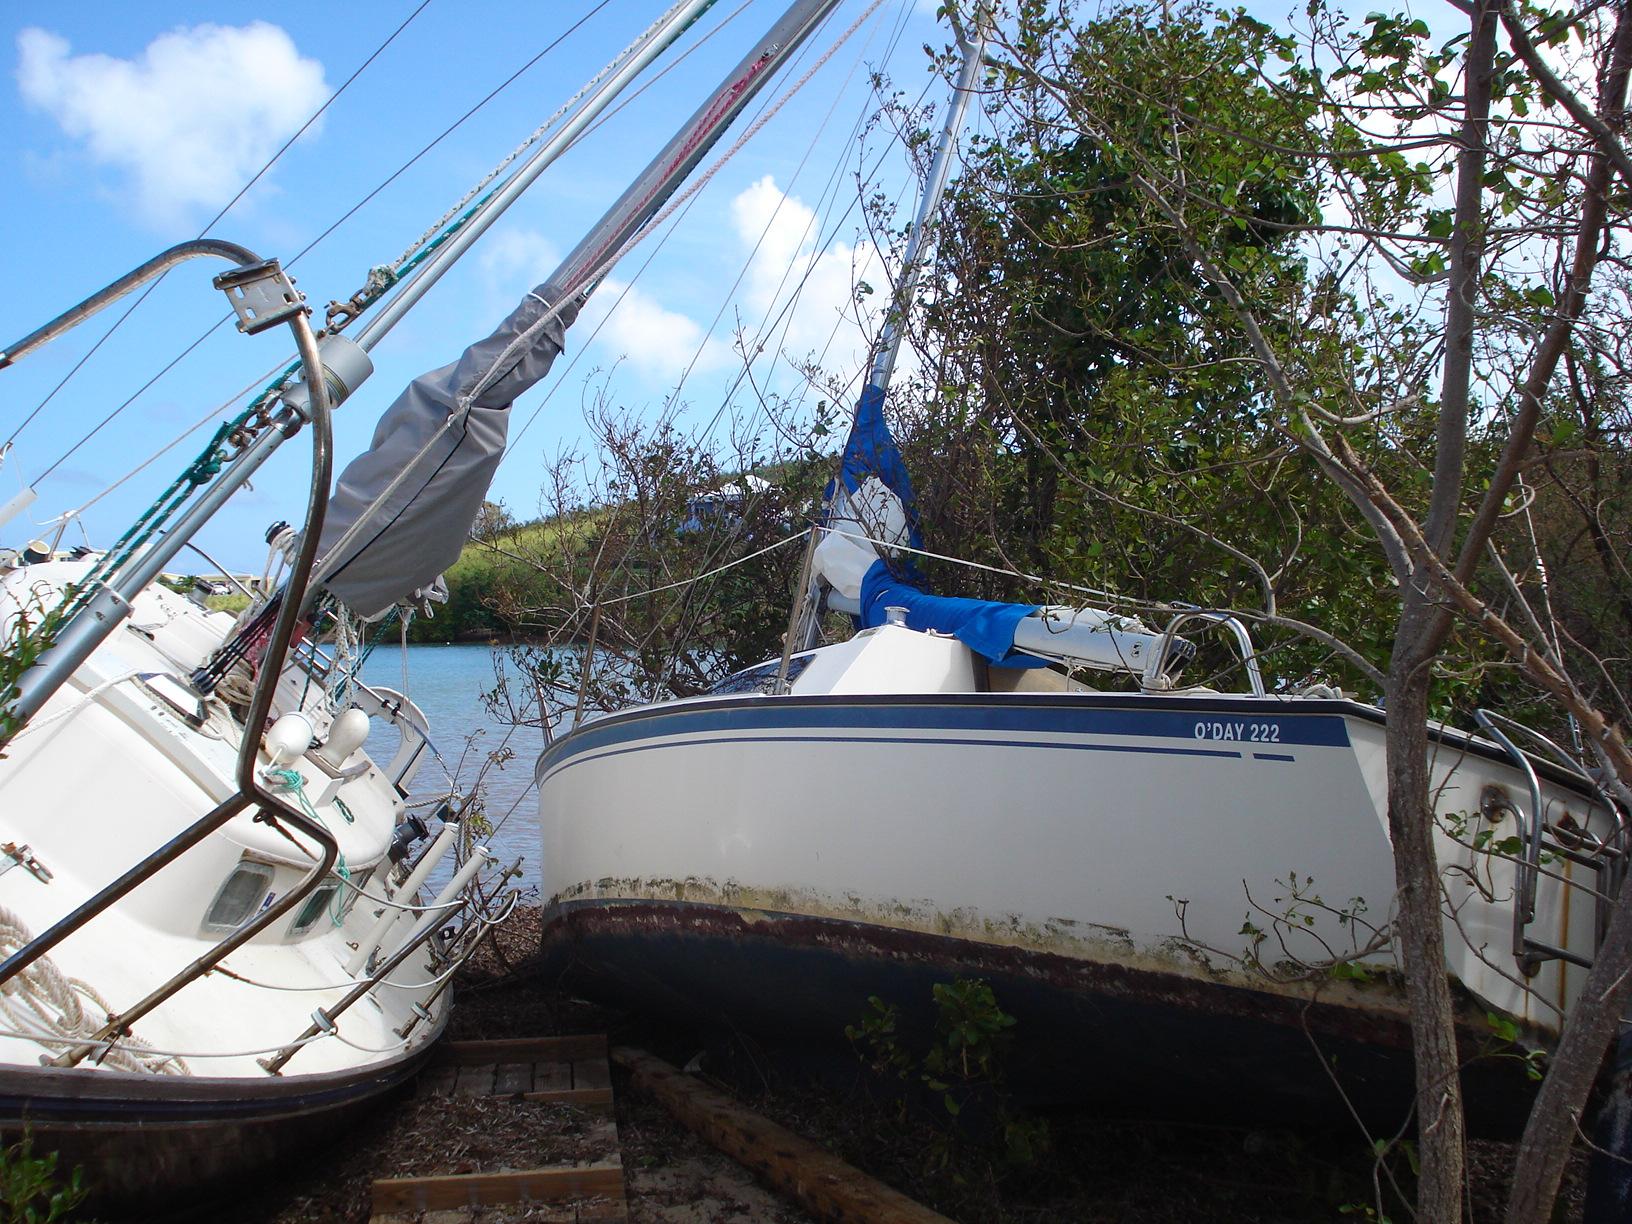 St.Croix (USVI) - Local Reports (Caribbean Hurricane Network) on